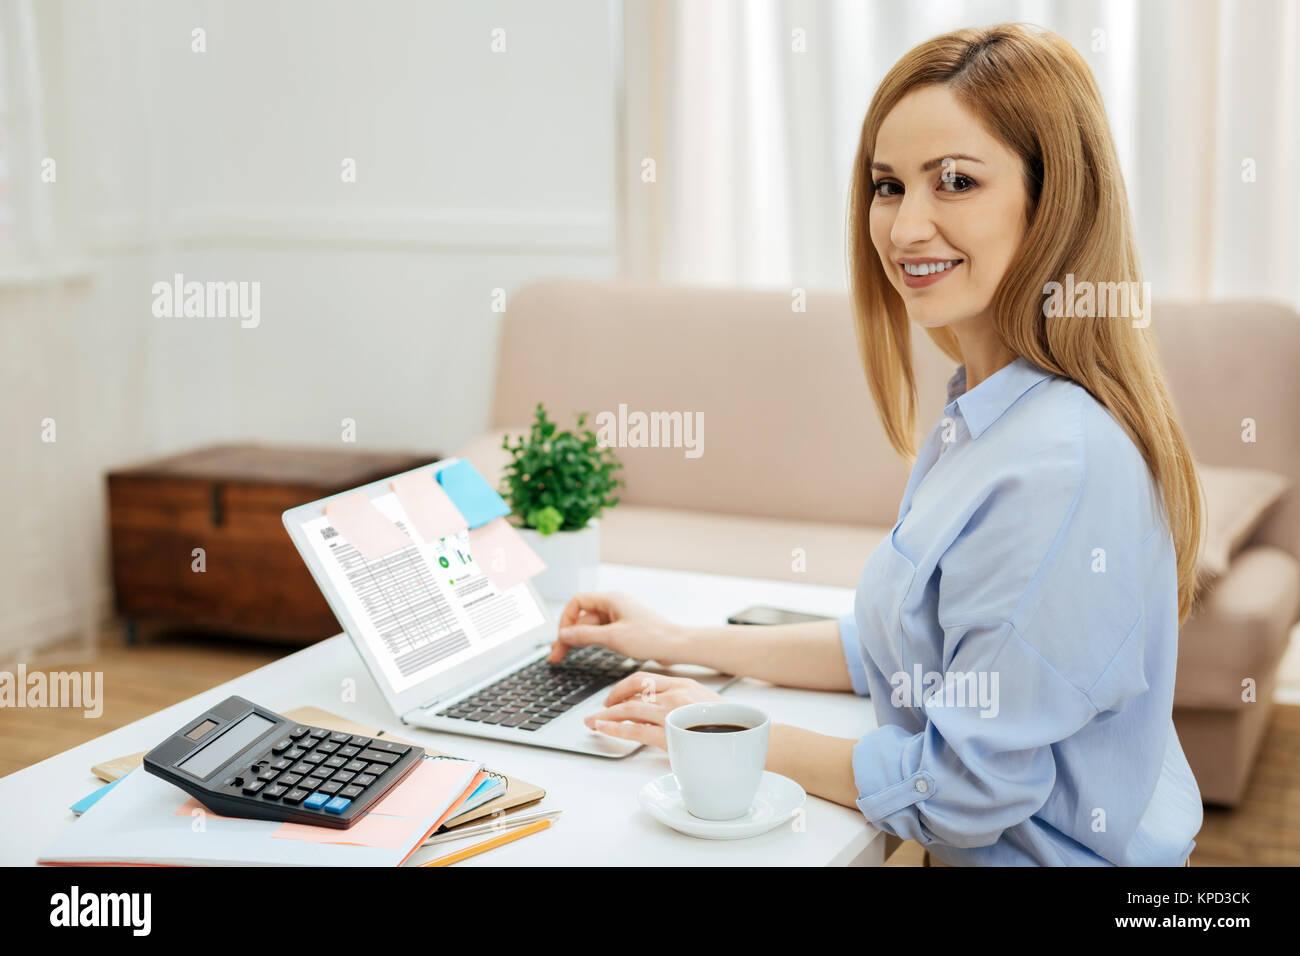 Inspirado empresaria trabaja desde casa Imagen De Stock